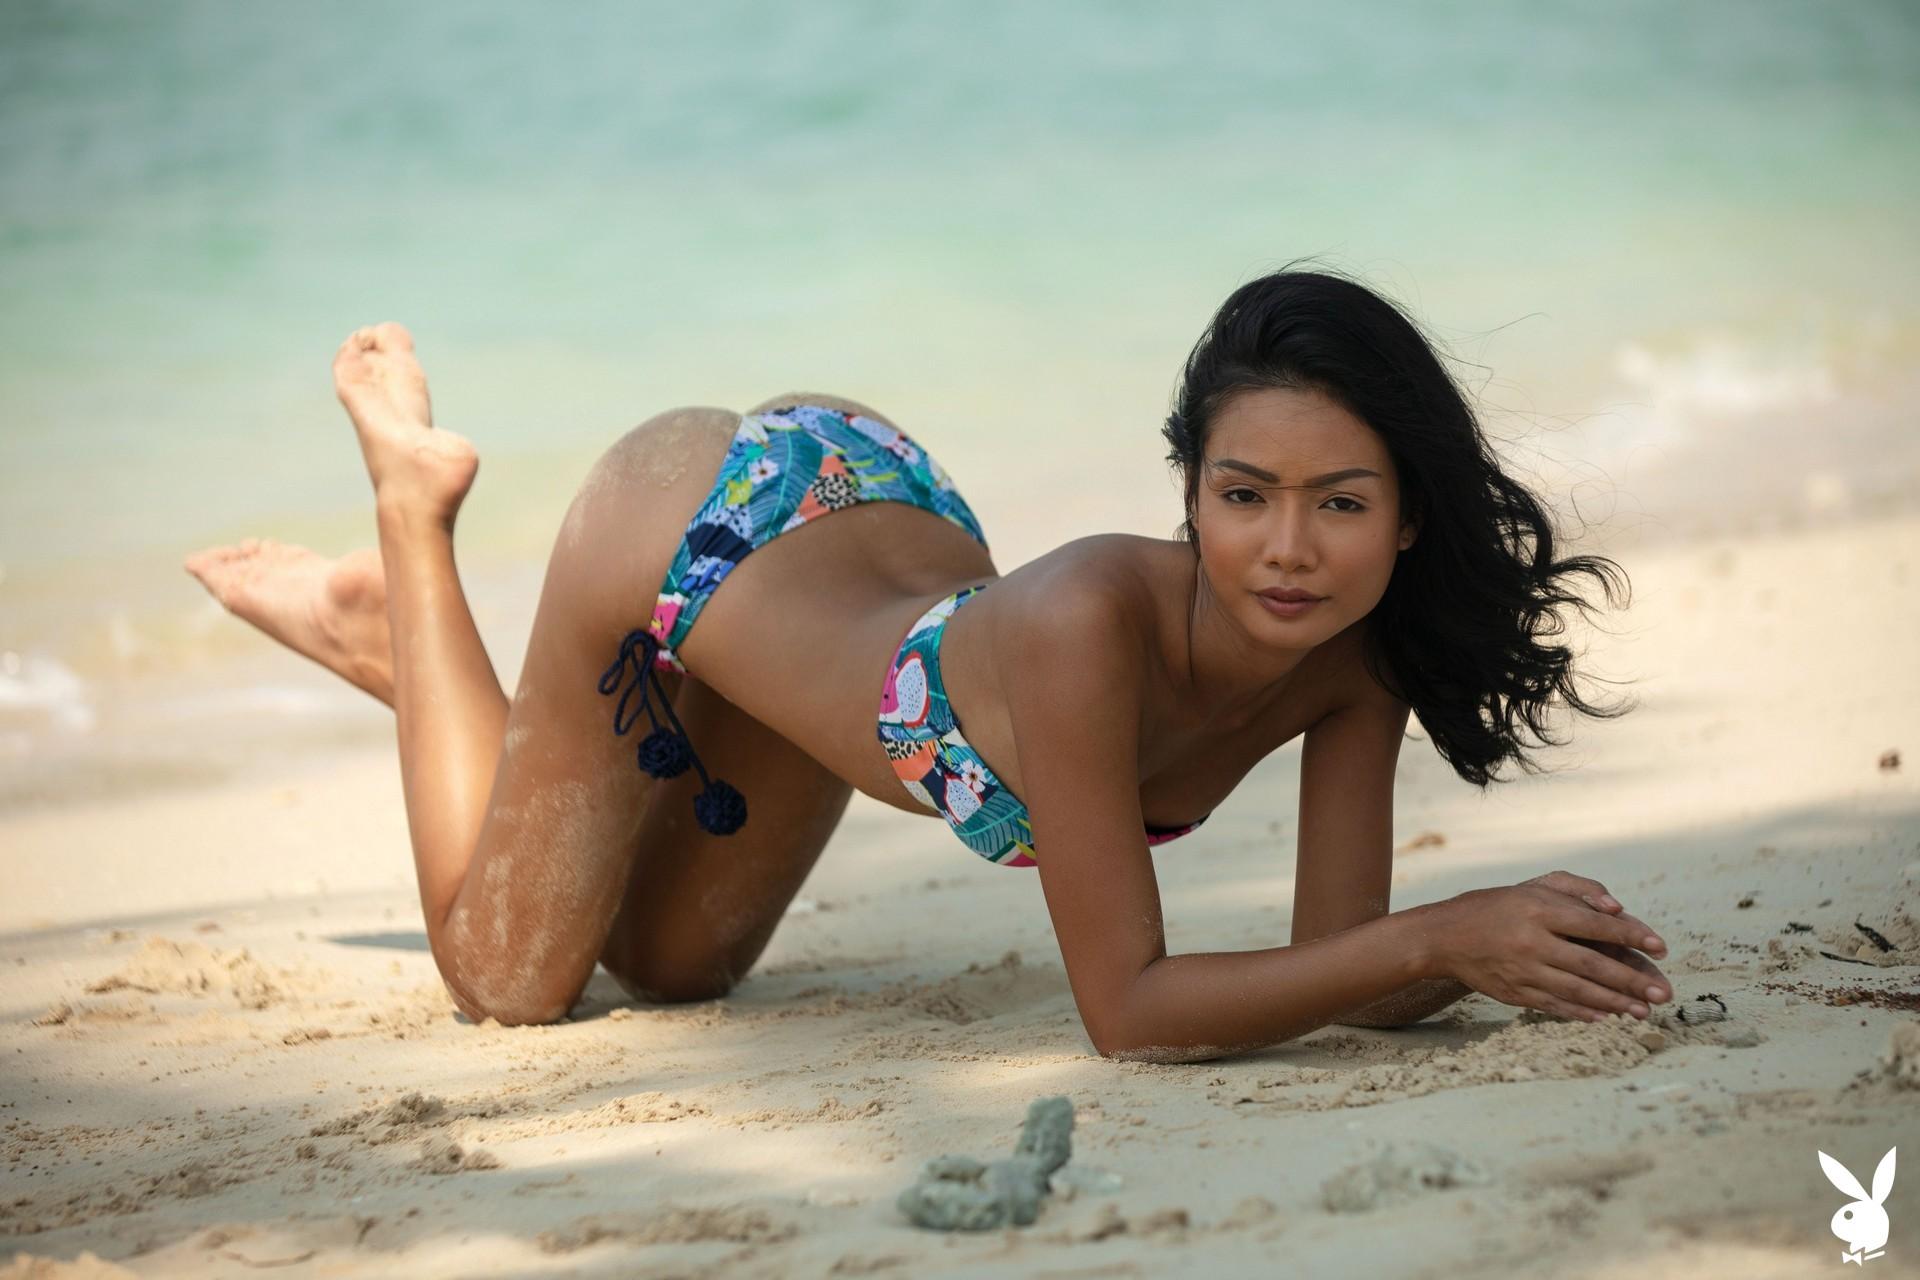 Magen Hana In Island Mentality Playboy Plus (5)